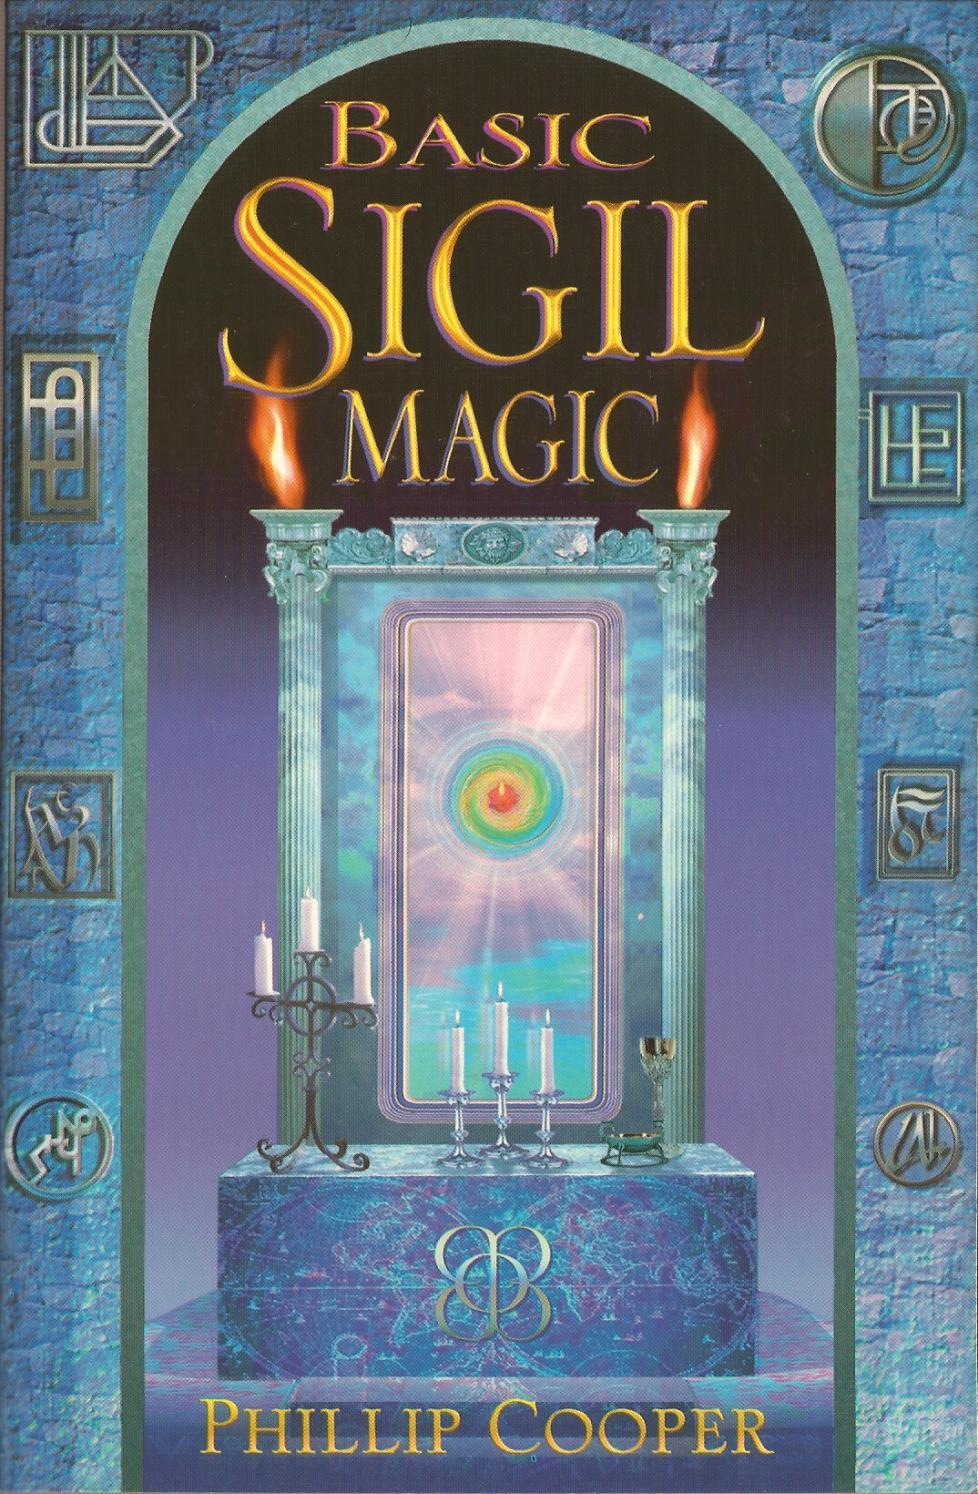 Basic sigil magic (2001) philip cooper by Julie Smith - issuu